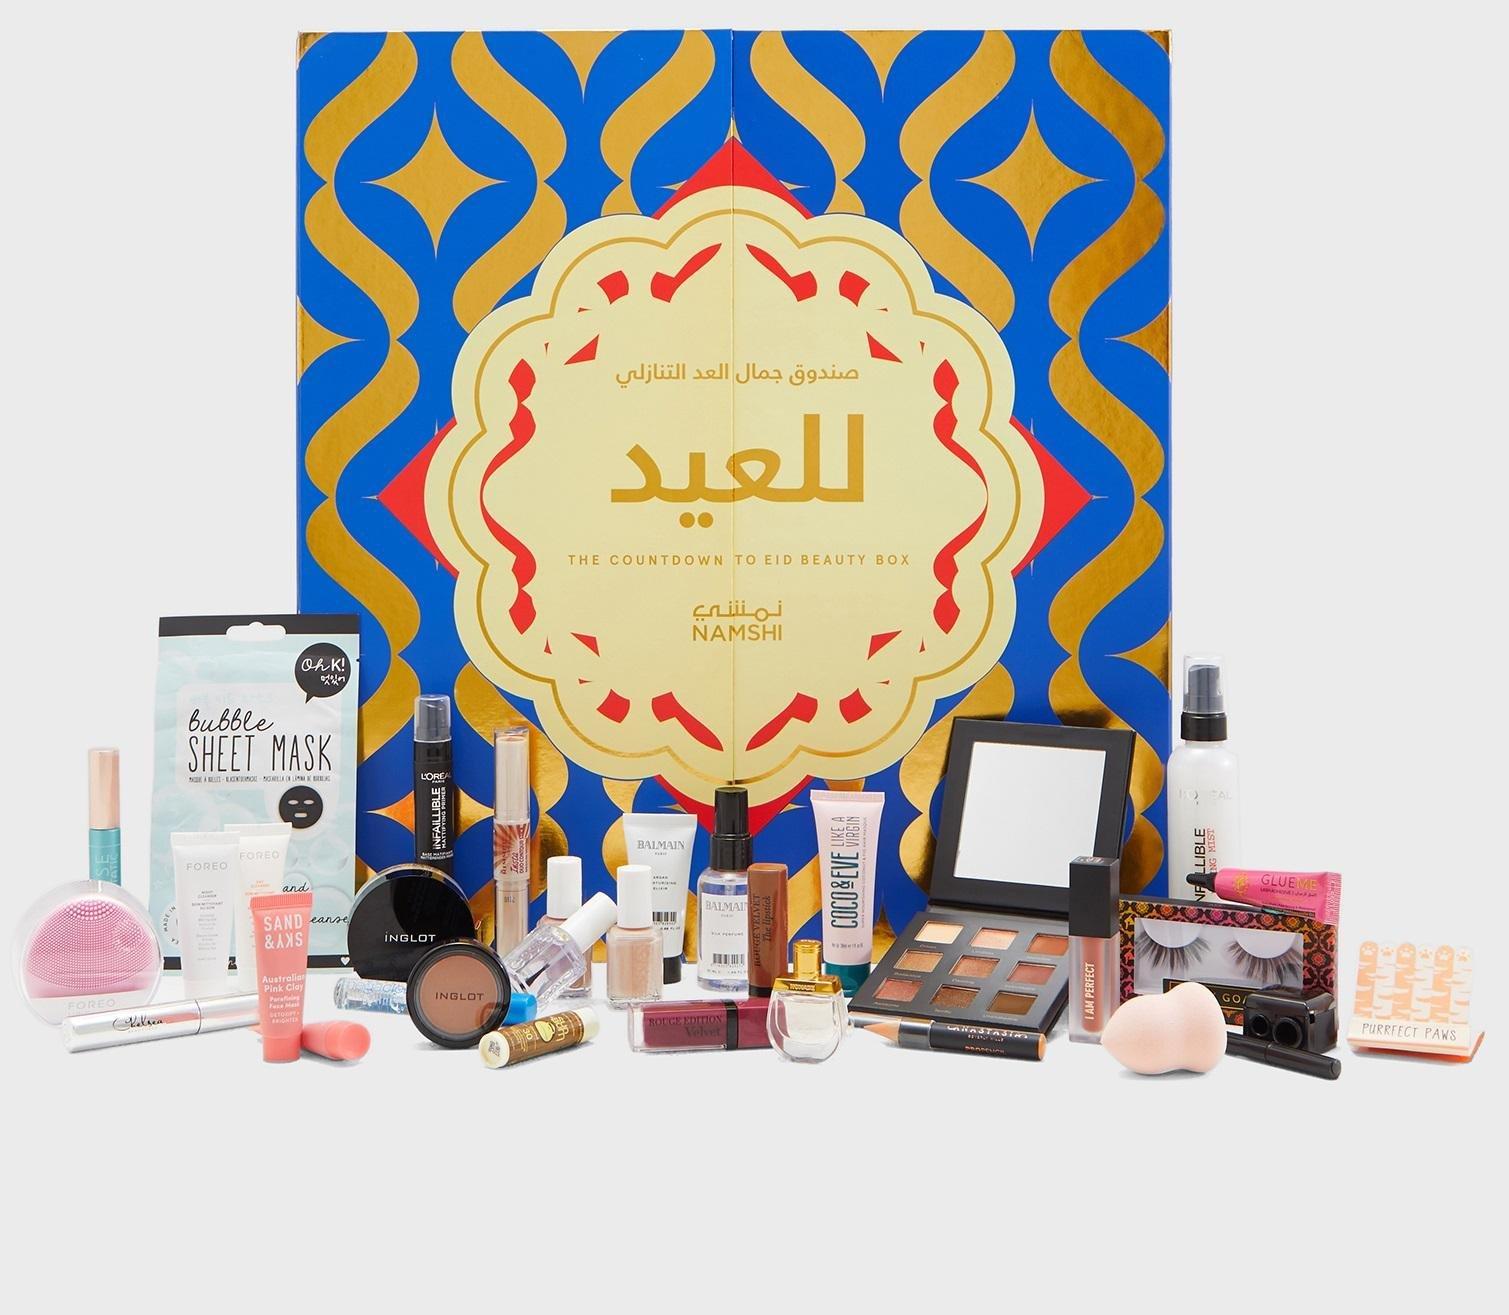 059dd6c2e أبرز عروض رمضان الجمالية في السعودية، استفيدي منها خلال الشهر الكريم